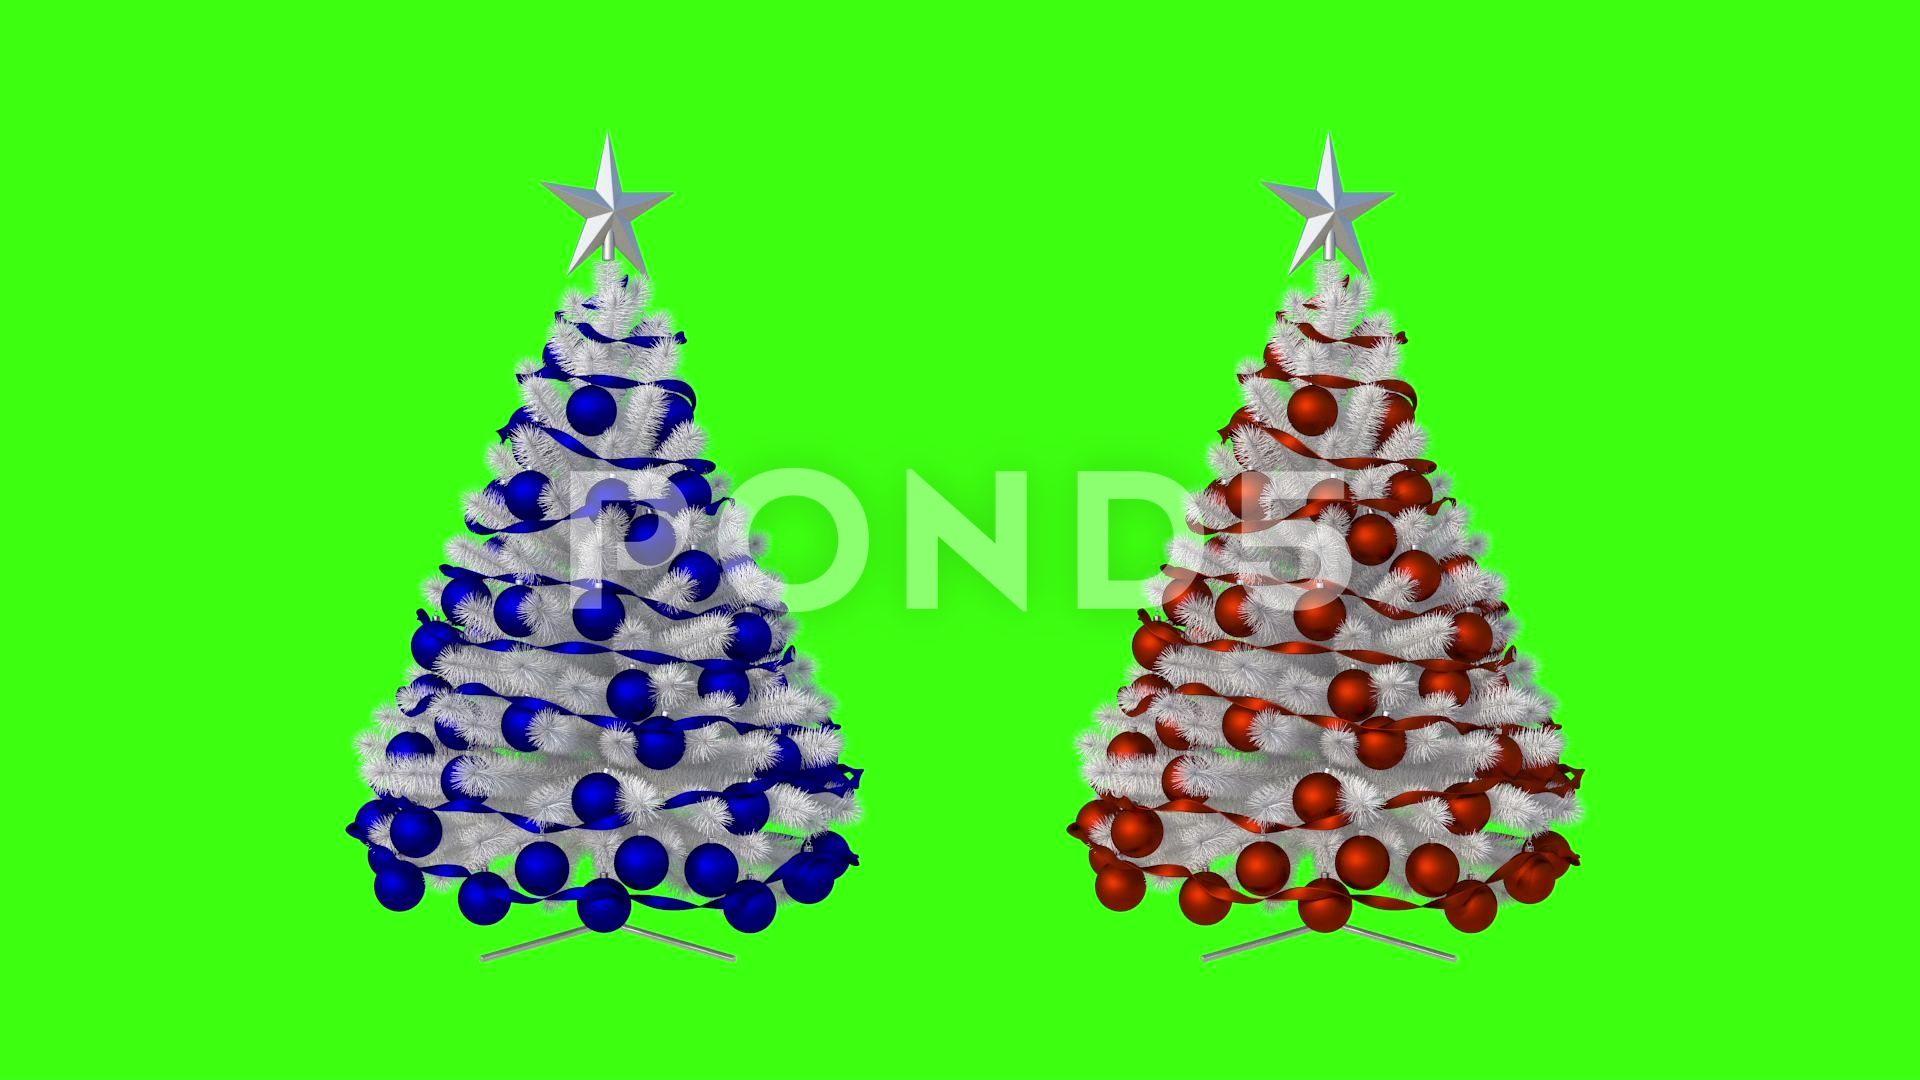 Christmas Tree Loop Animation Green Screen Stock Footage Ad Loop Animation Christmas Tree Christmas Tree Christmas Christmas Ornaments